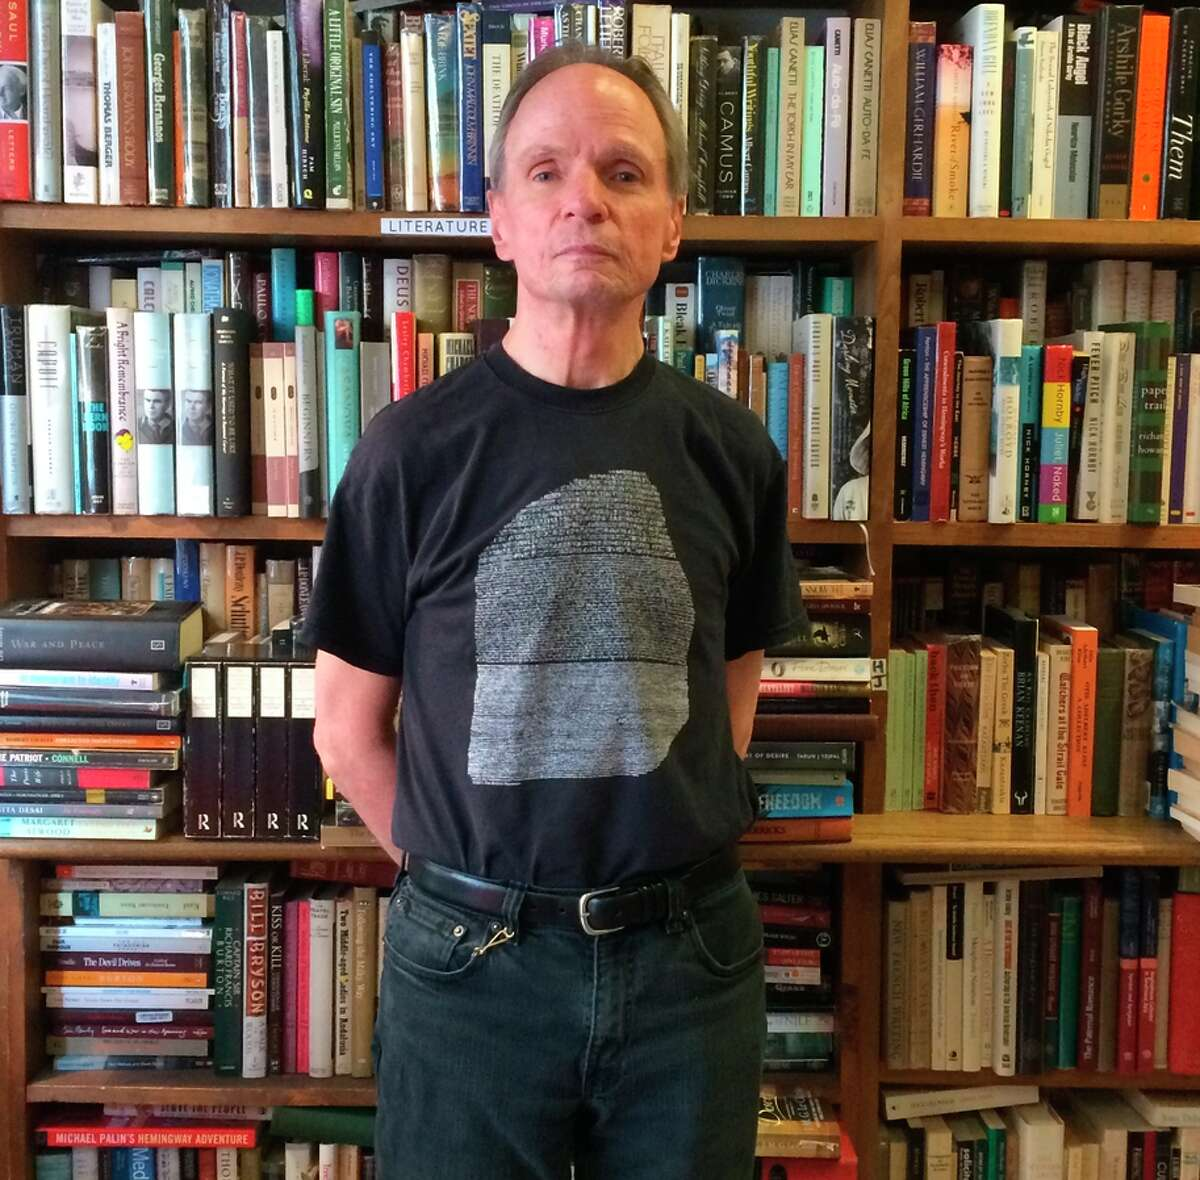 Jim Carroll, owner of San Francisco Book Co.